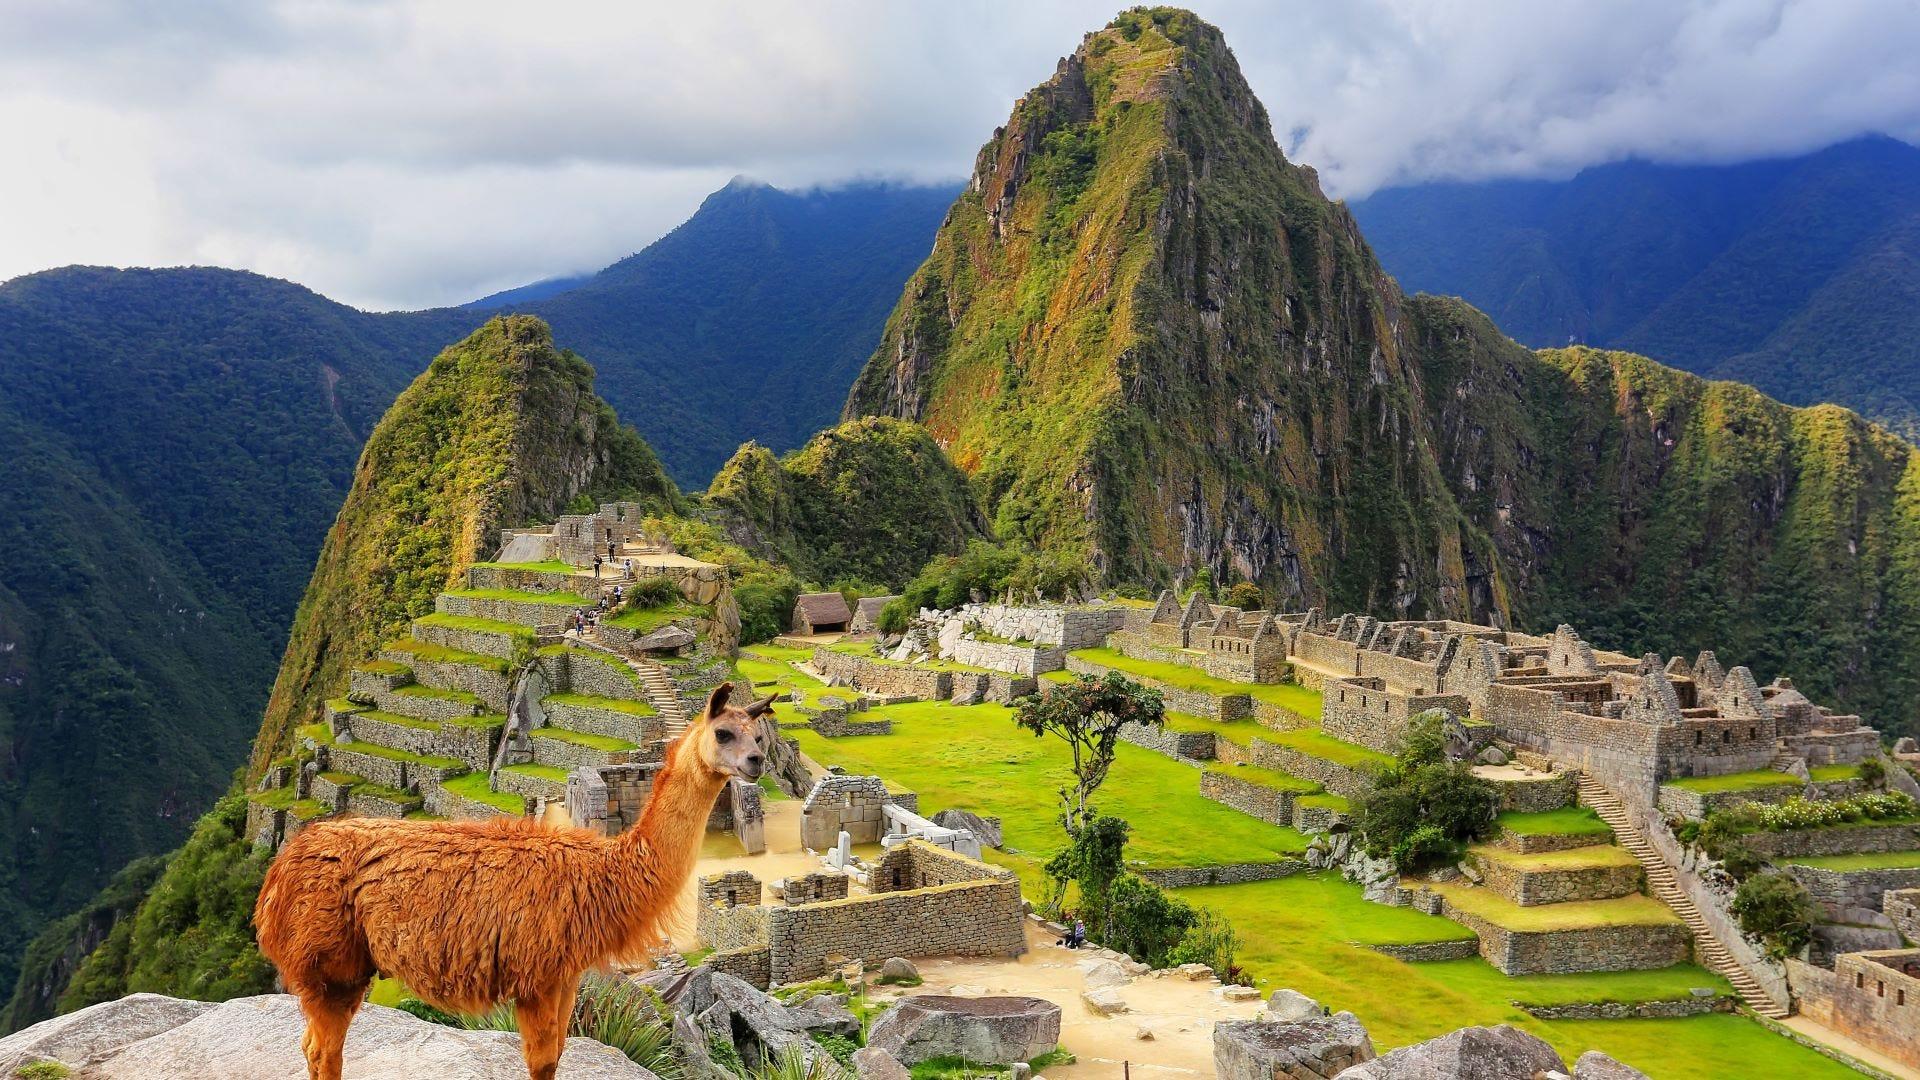 Llama standing at Machu Picchu.